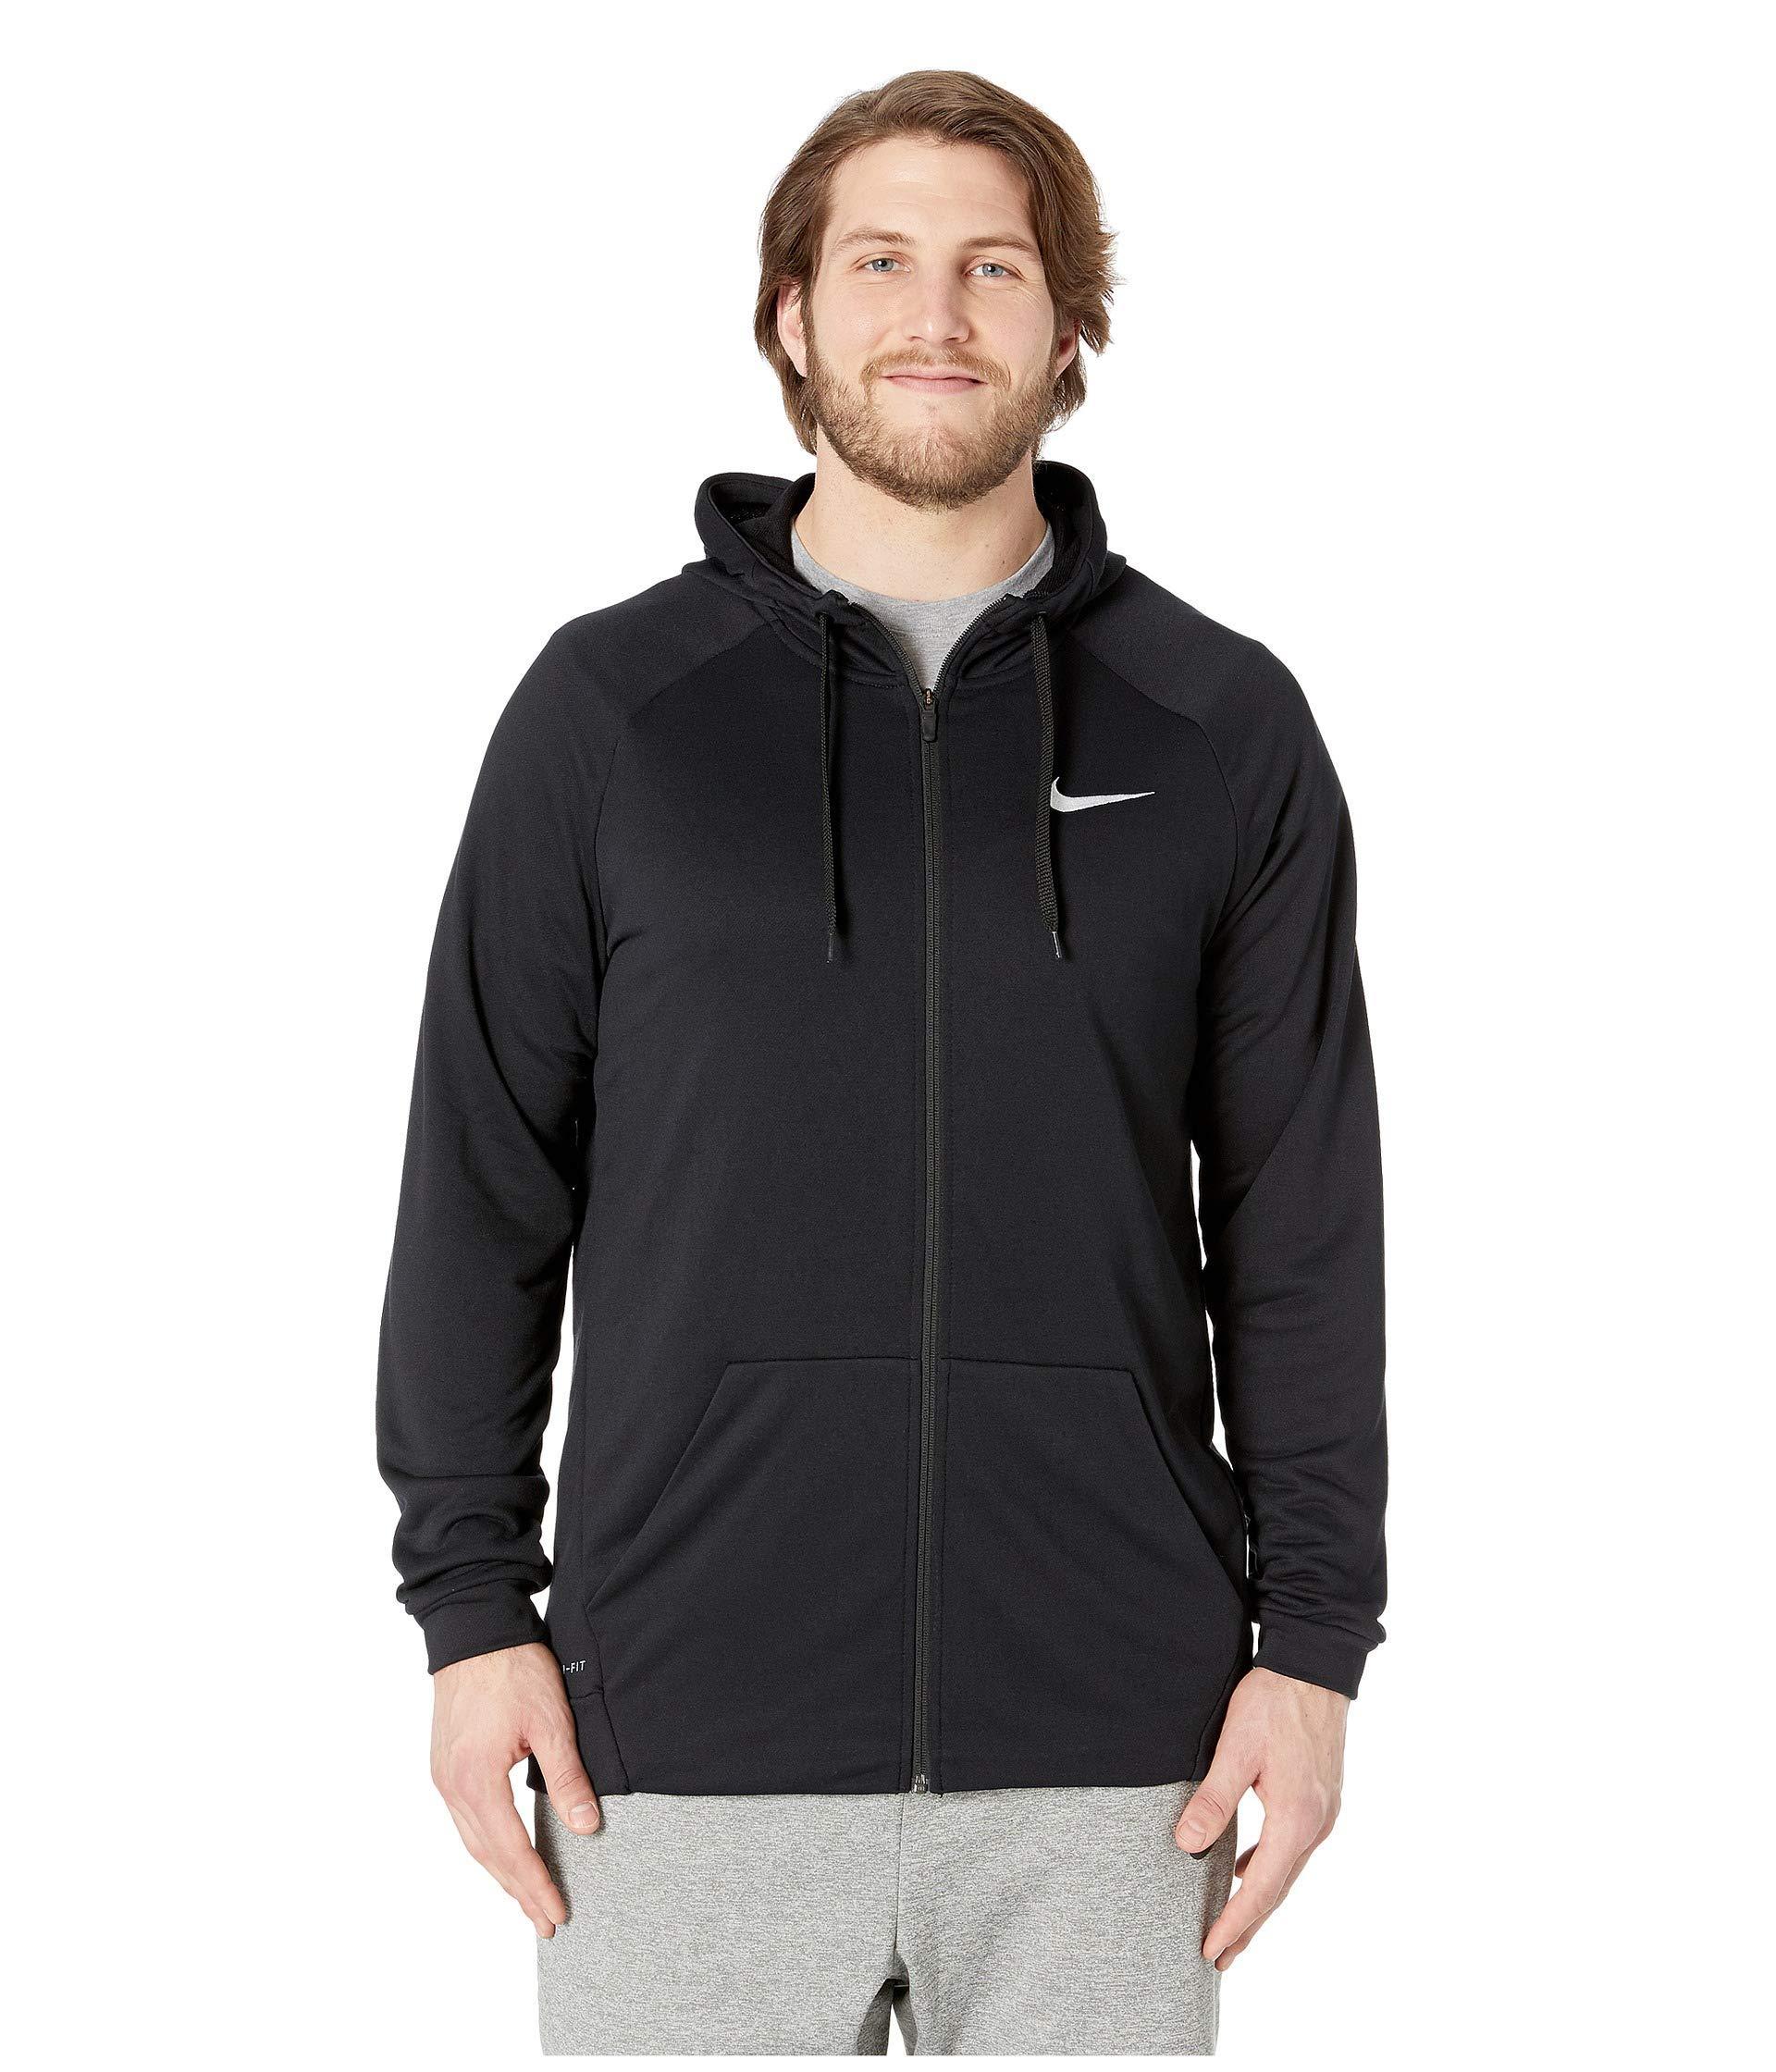 3aabb7bf773 Nike. Big Tall Dry Training Full Zip Hoodie (black white) Men s Fleece